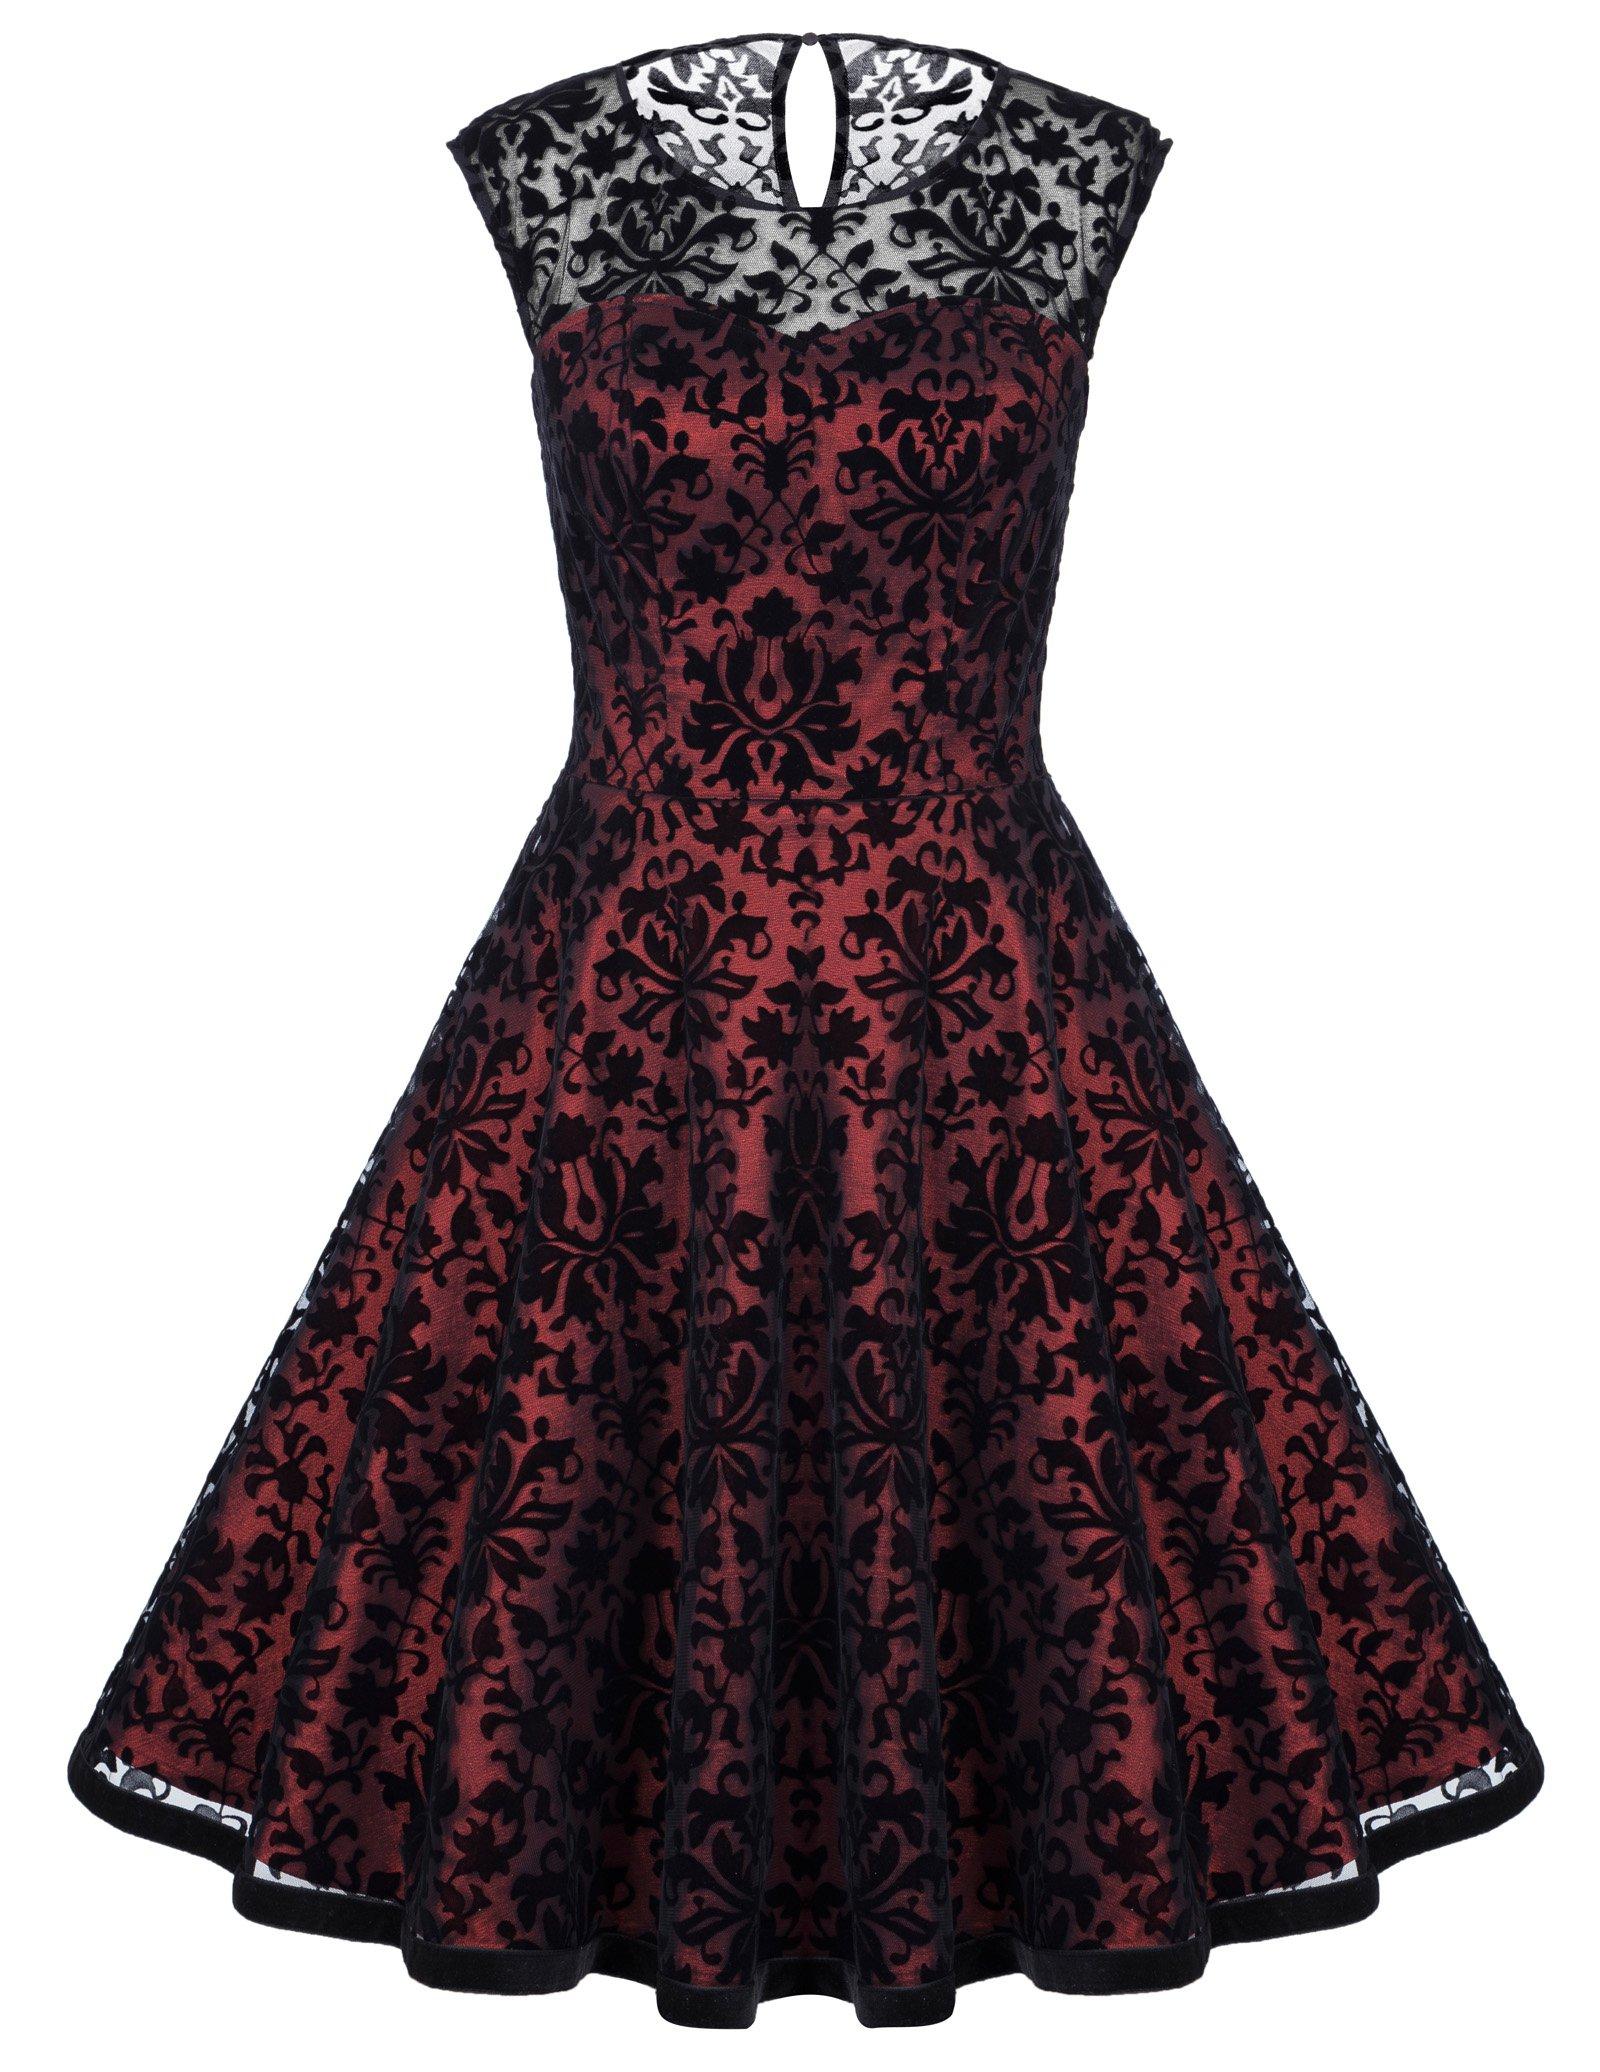 Belle Poque Ladies Vintage Lace Dress Elegant Formal Swing Dresses S BP278-1